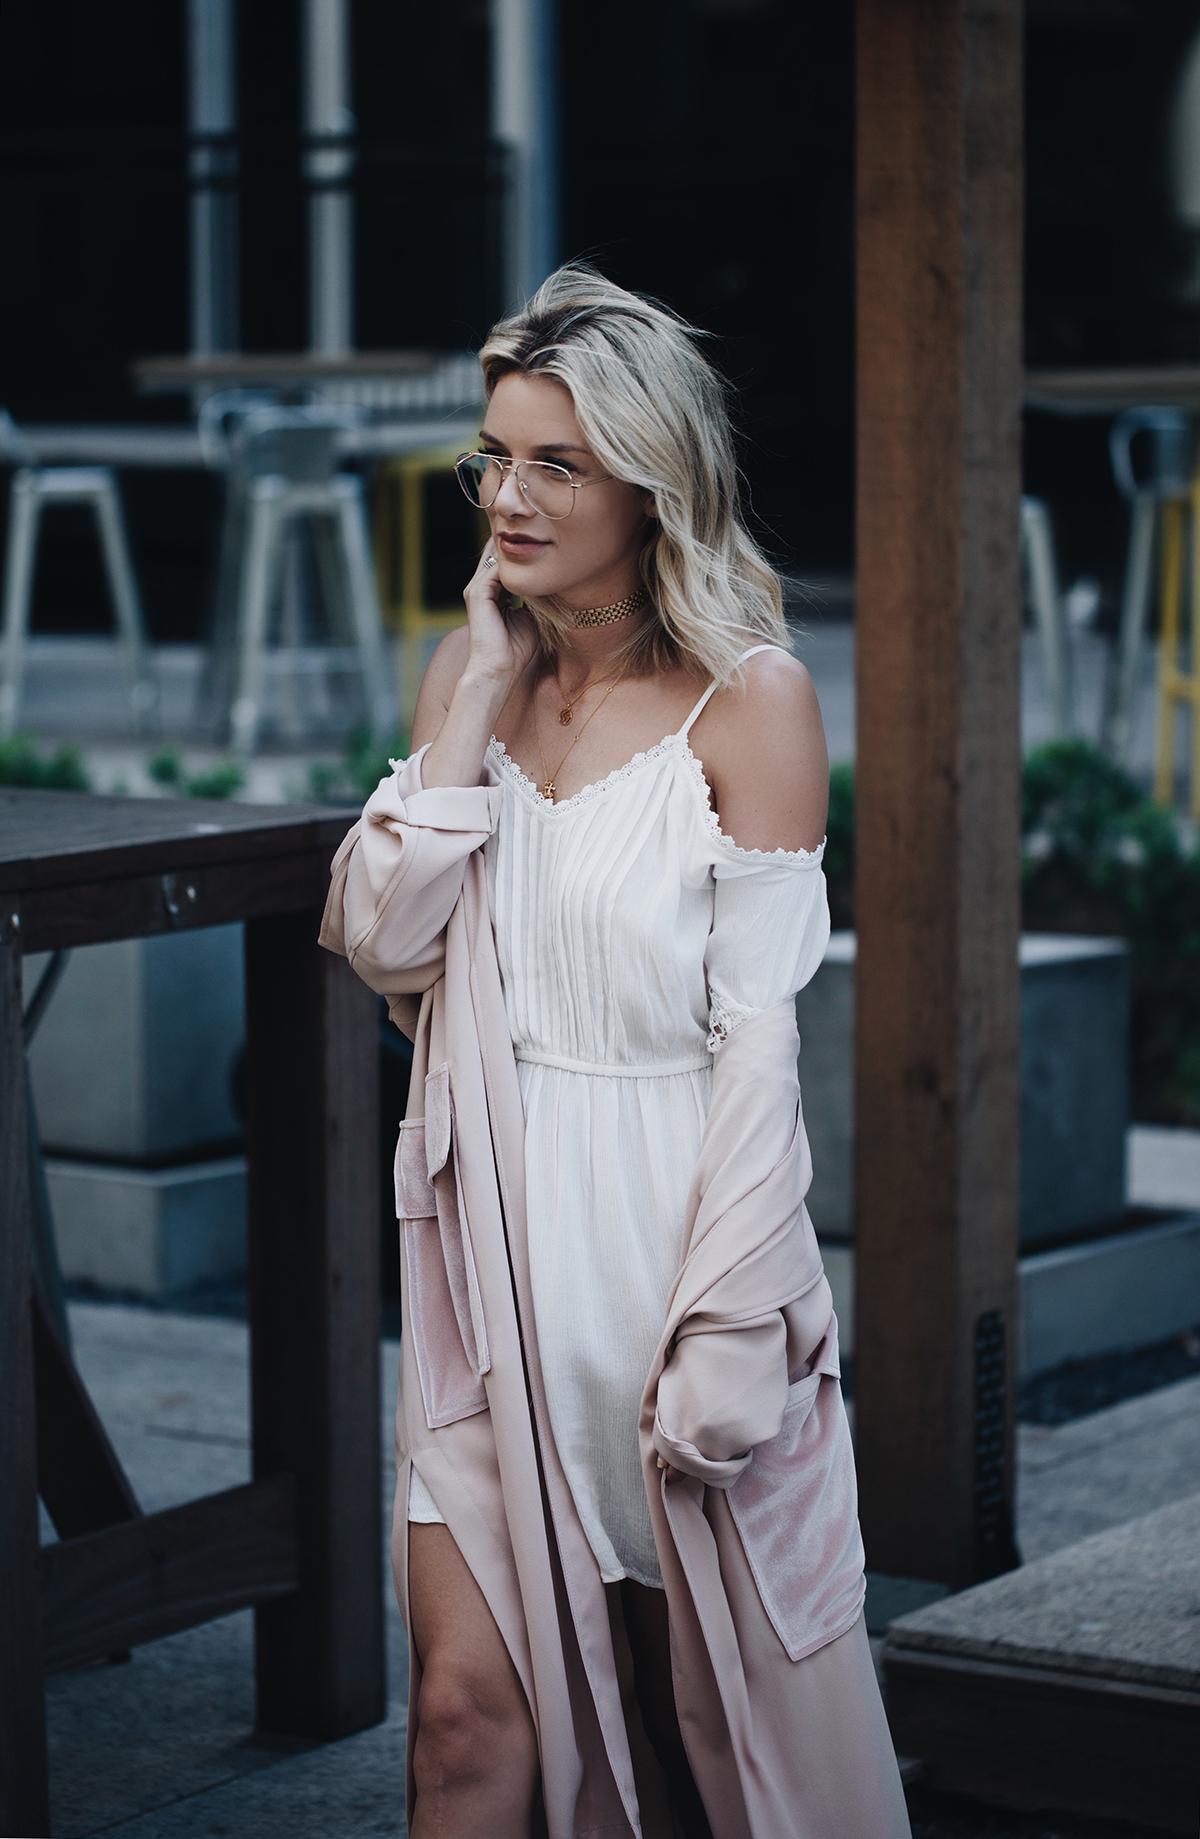 cold shoulder dress daytime date outfit